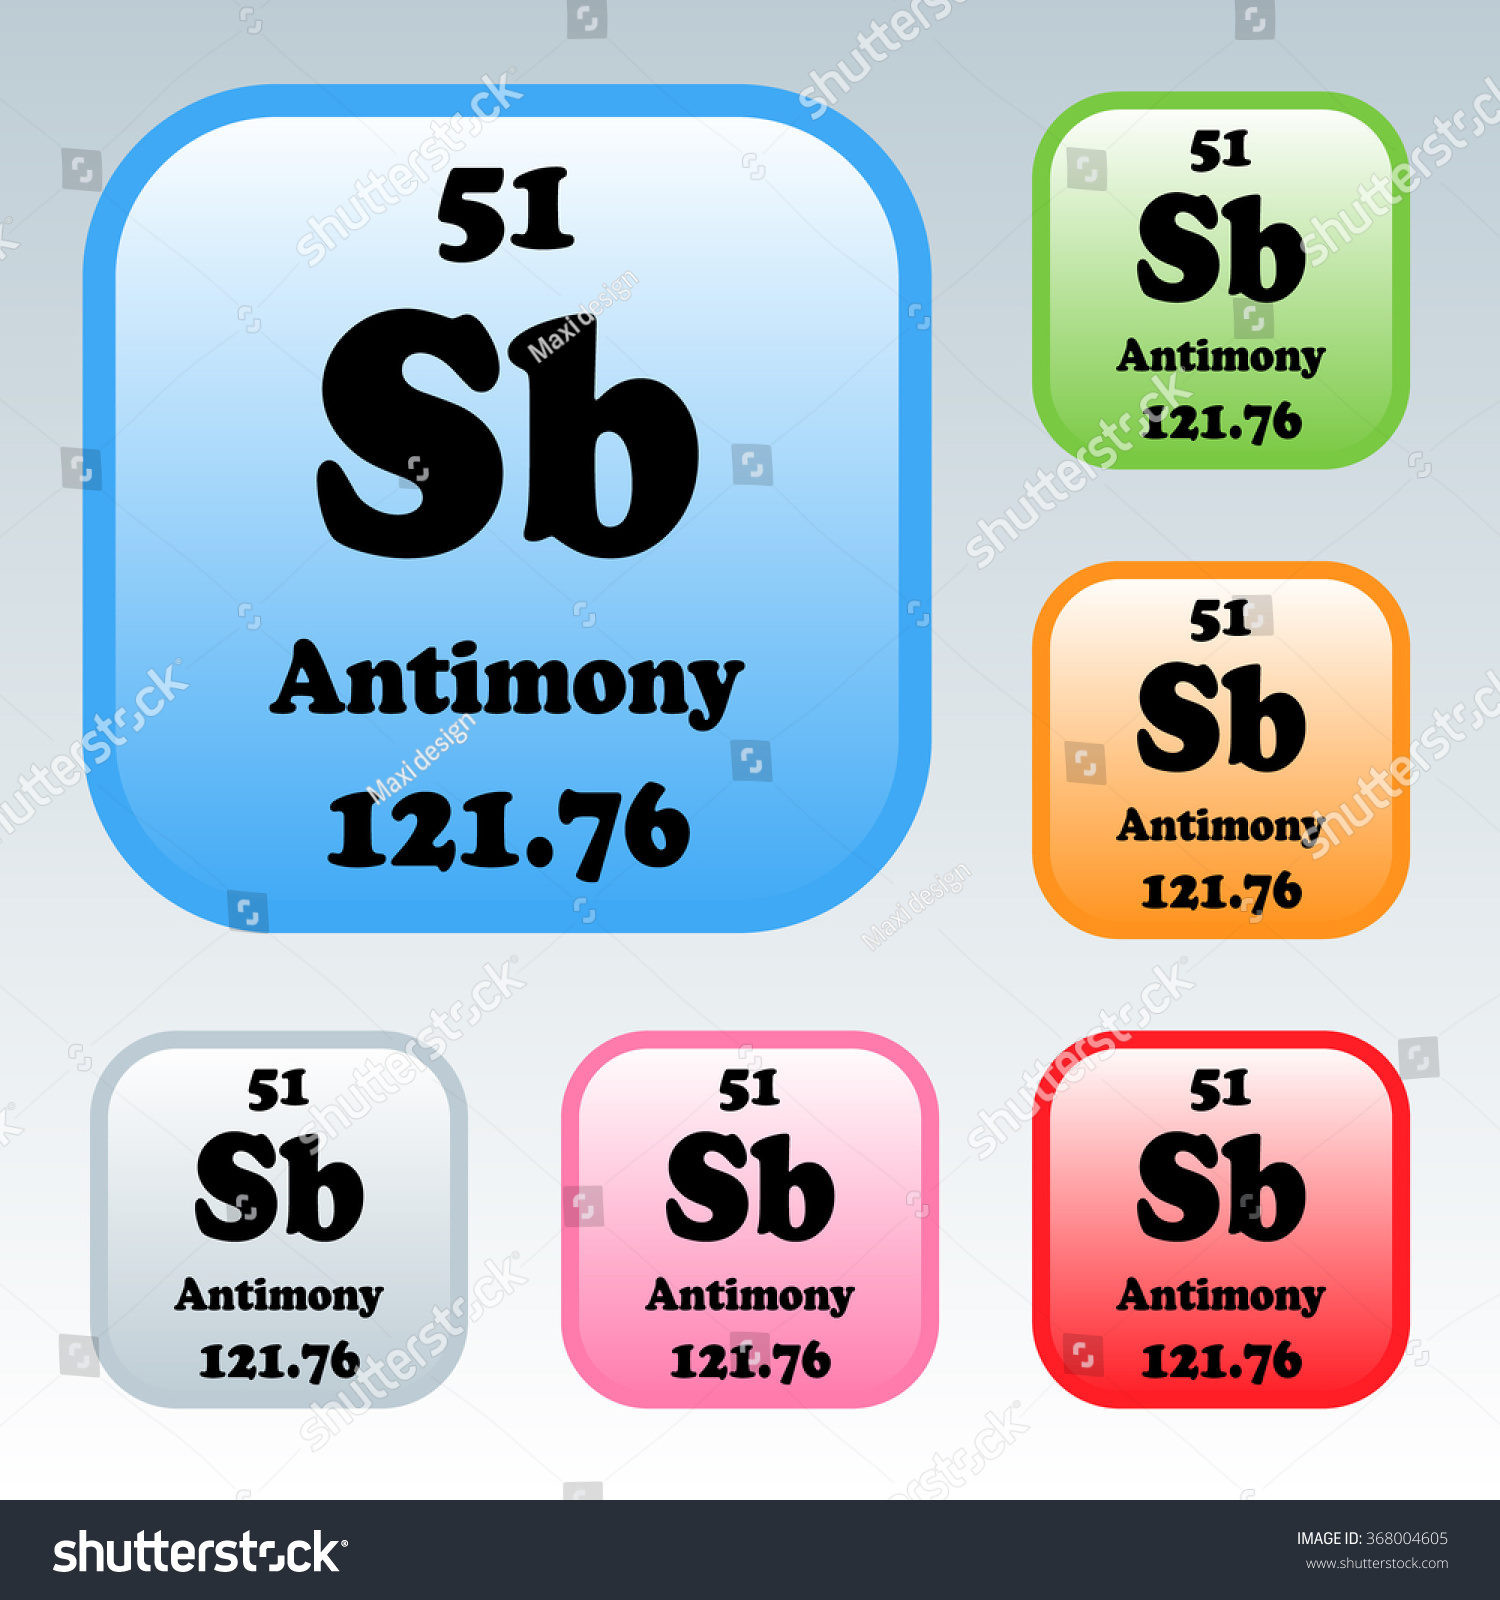 Periodic table elements antimony stock vector 368004605 shutterstock the periodic table of the elements antimony gamestrikefo Choice Image